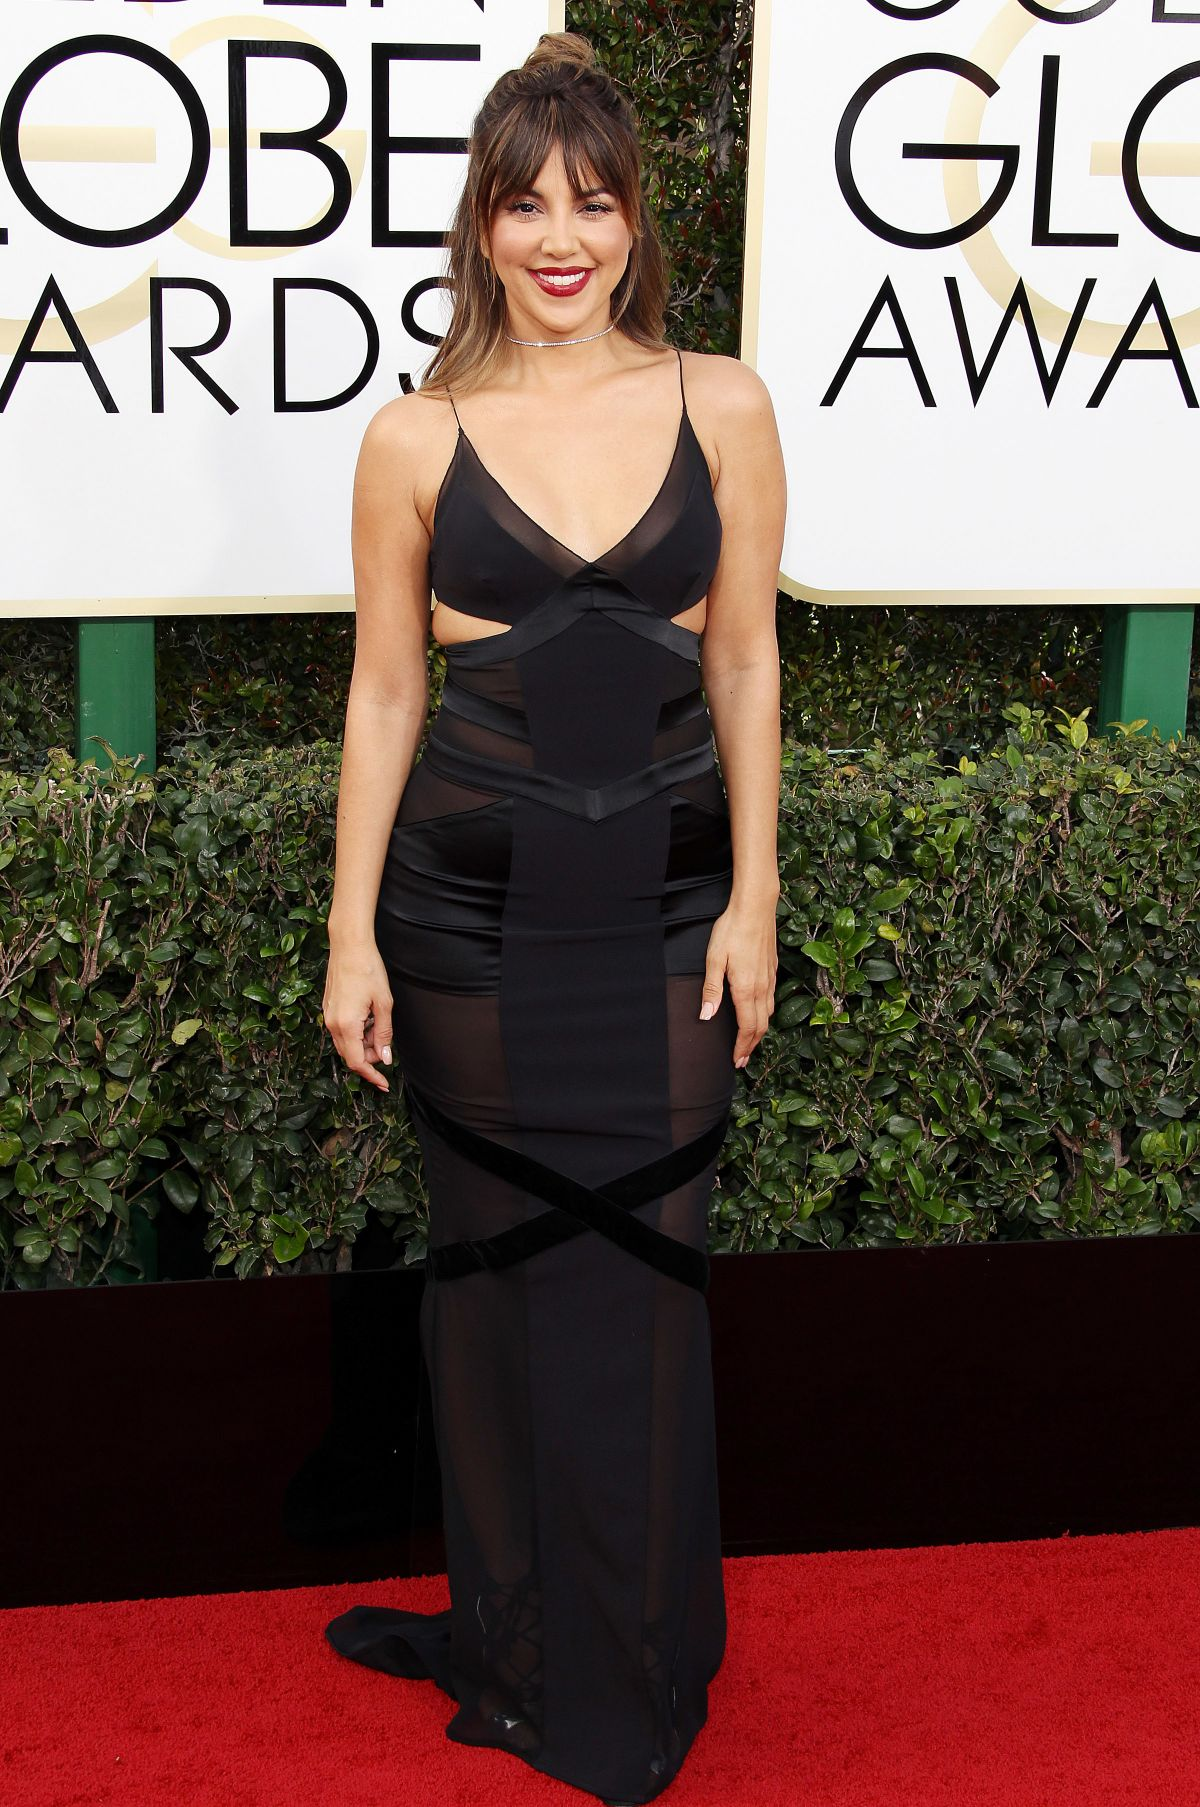 LIZ HERNANDEZ at 74th Annual Golden Globe Awards in Beverly Hills 01/08/2017